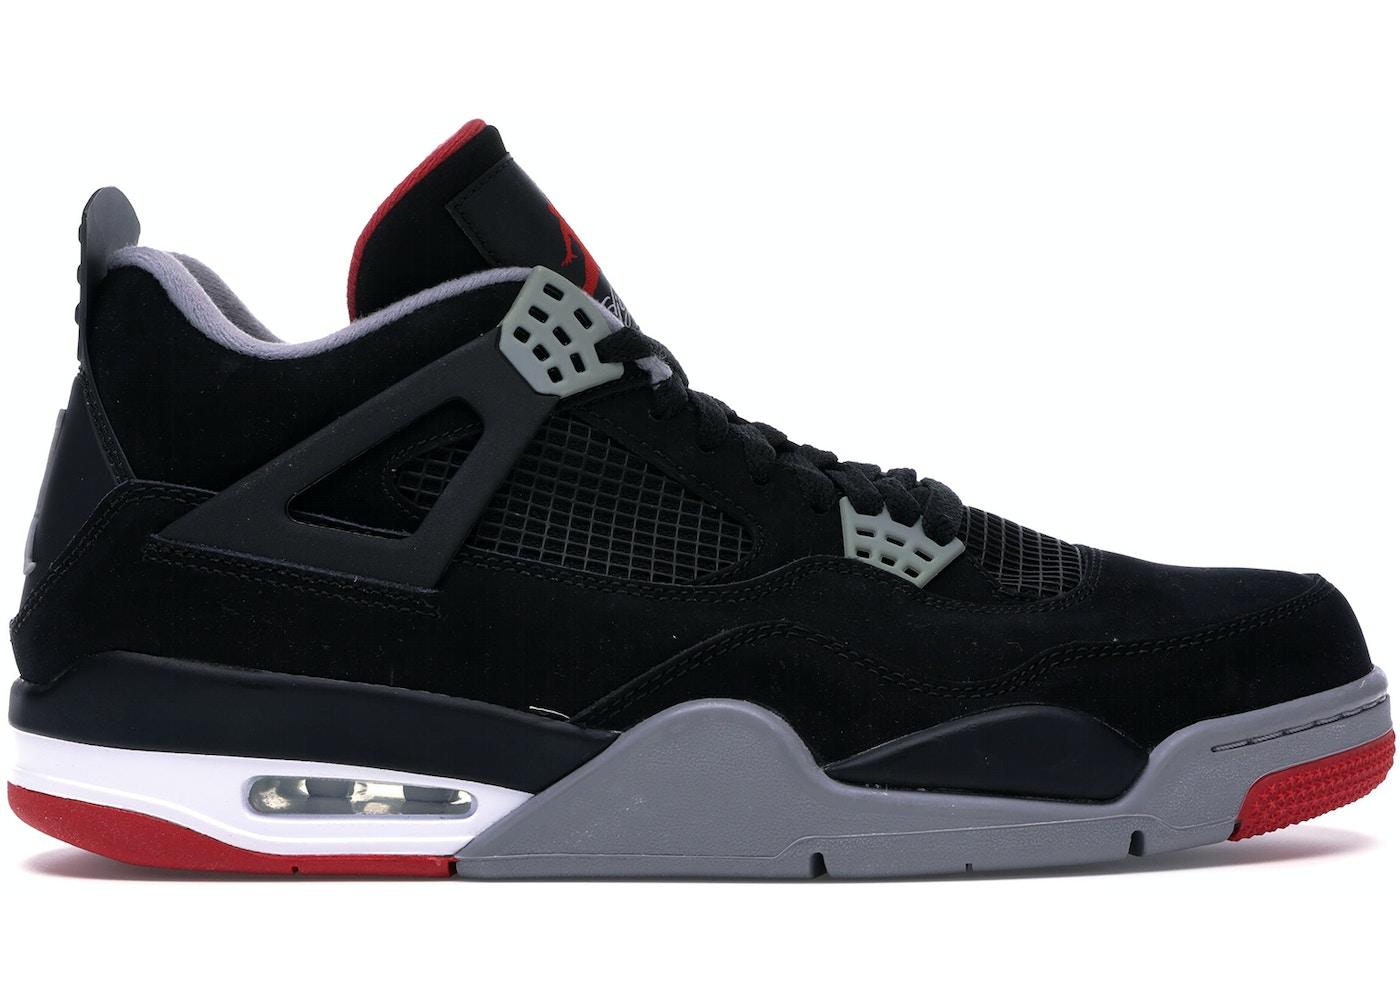 8279f068b40 Jordan 4 Retro Black Cement (2012) - 308497-089